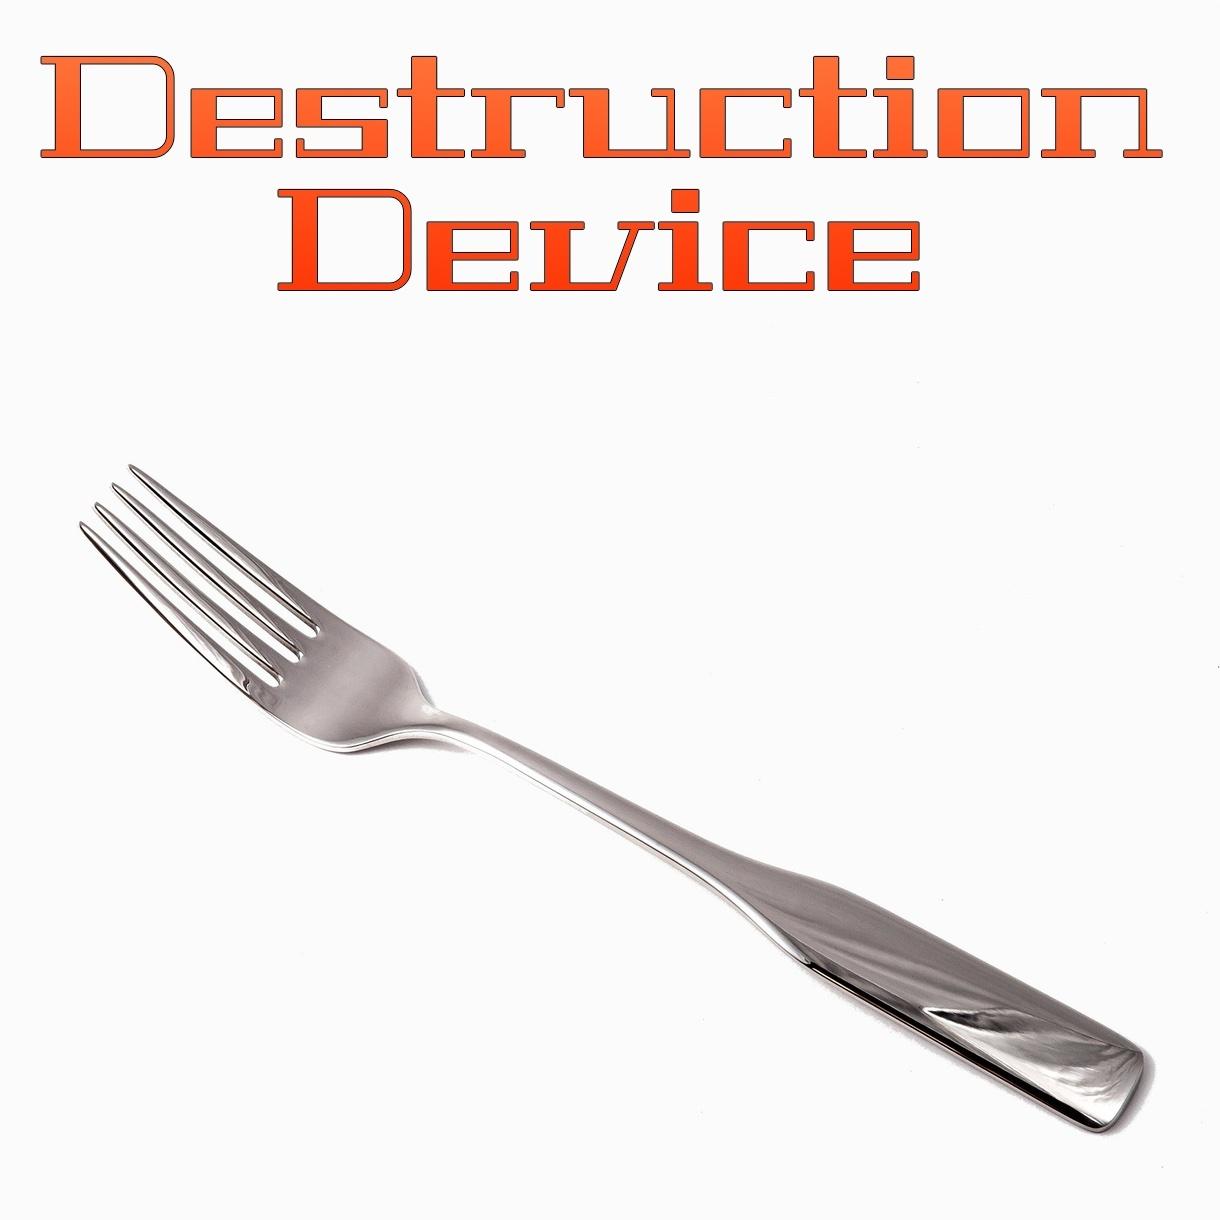 Wretched Destroyer